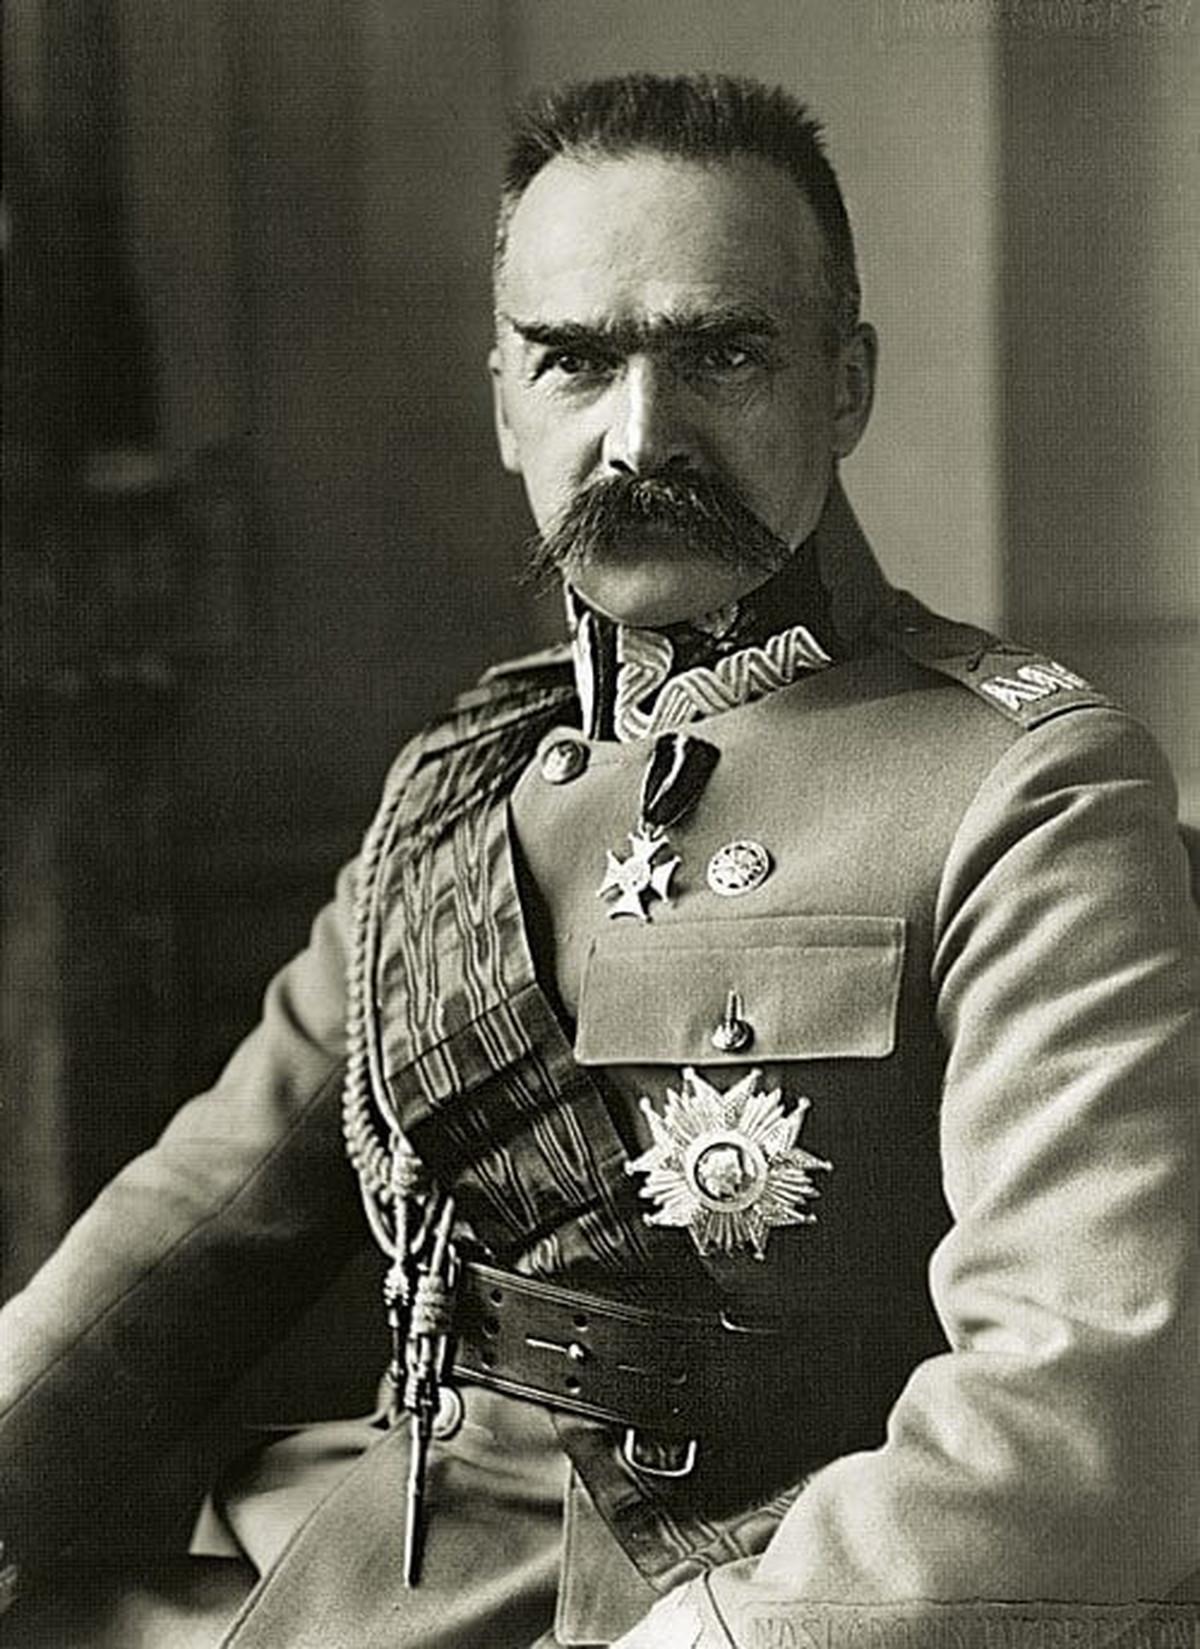 https://upload.wikimedia.org/wikipedia/commons/6/61/J%C3%B3zef_Pi%C5%82sudski_%28-1930%29.jpg